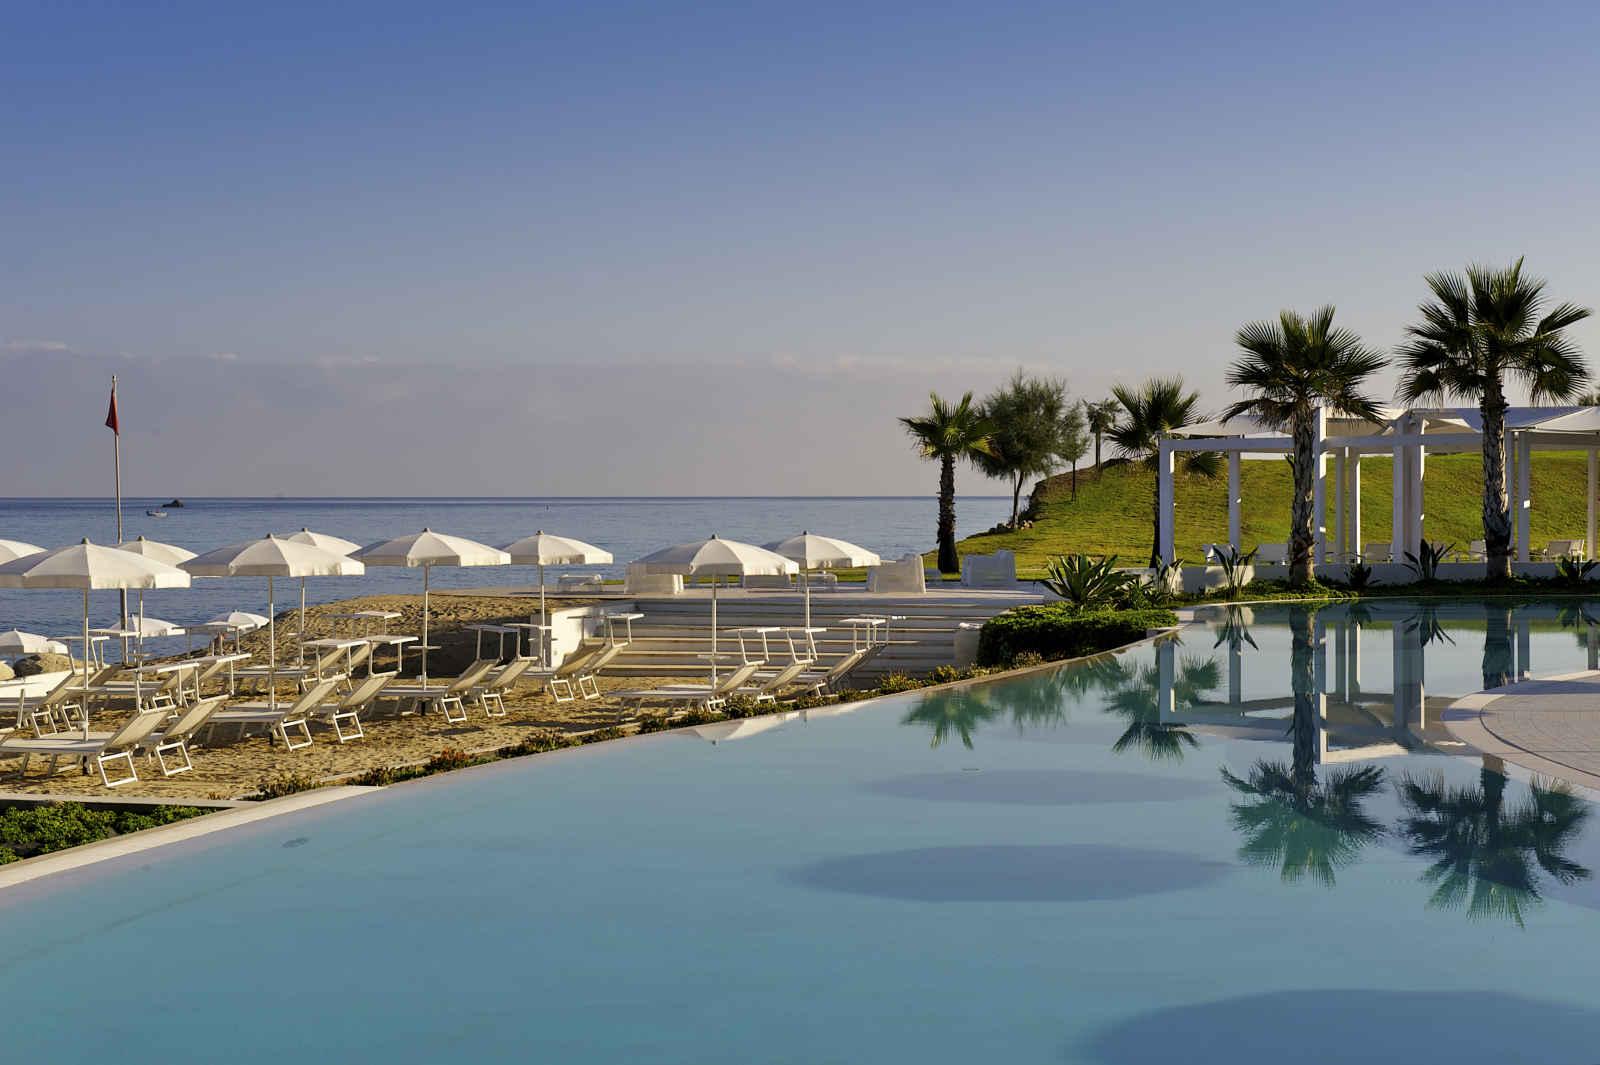 Séjour Italie - Capovaticano Resort Thalasso & Spa - 4*